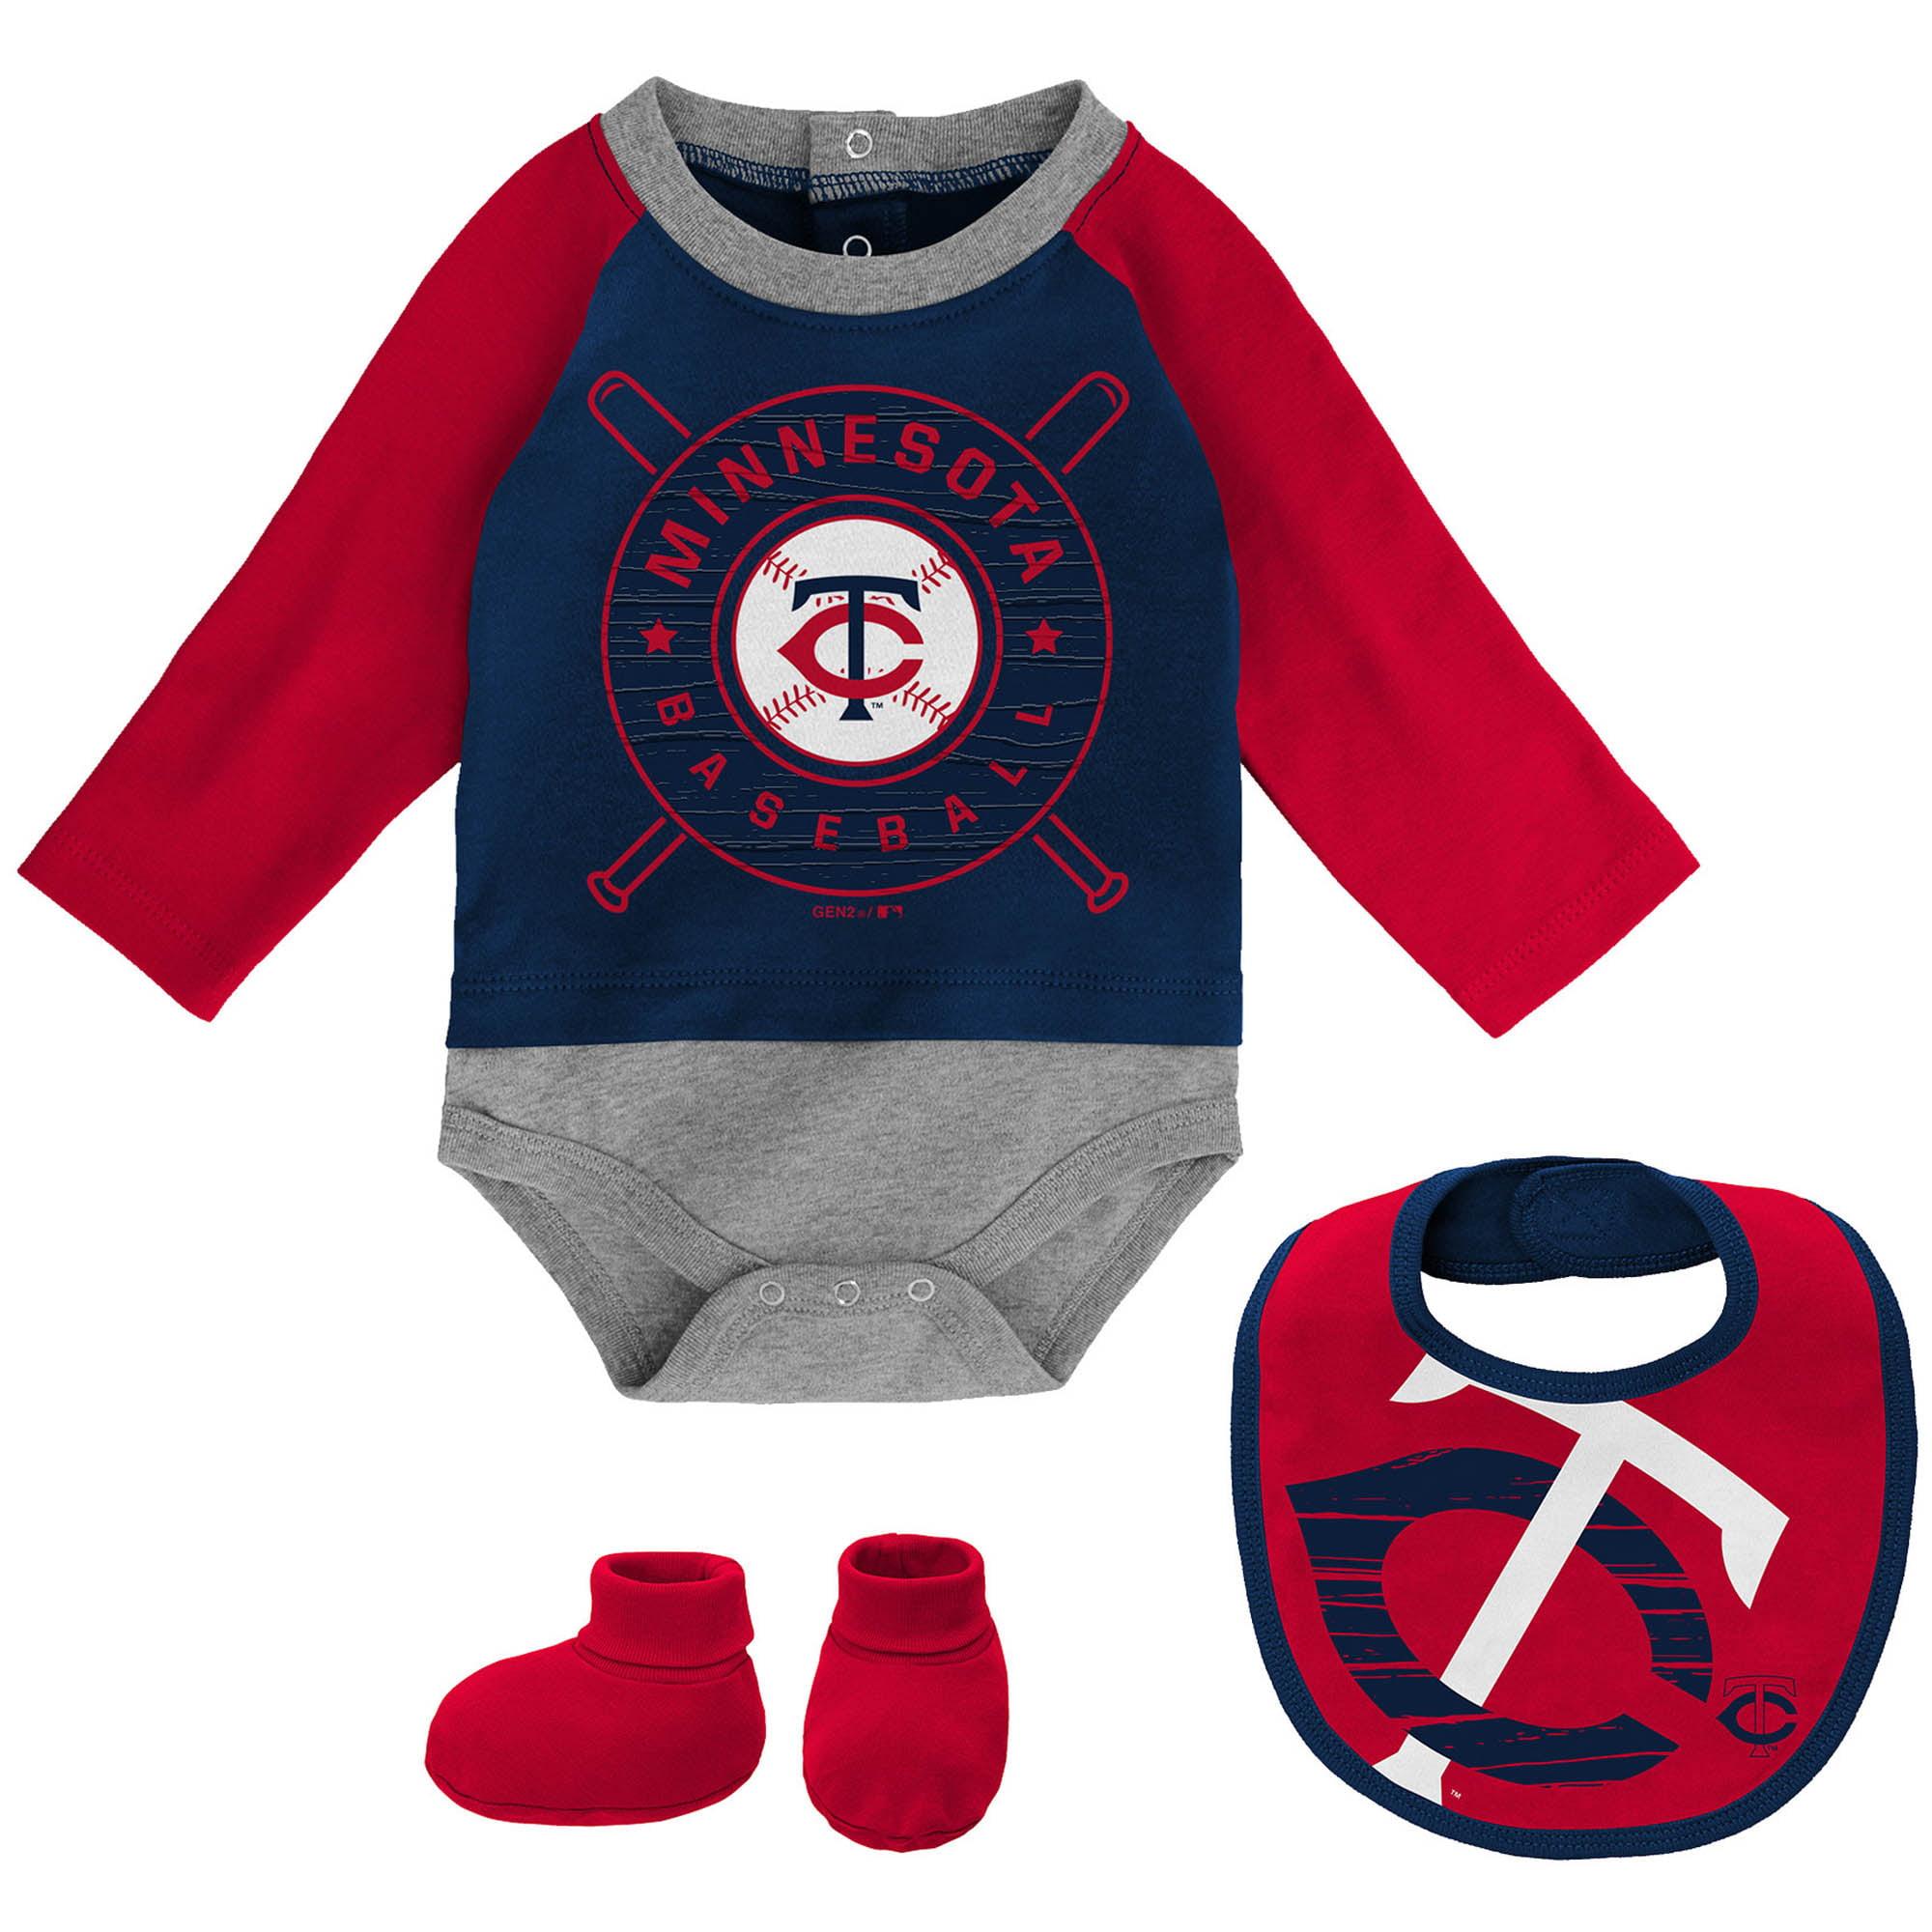 Minnesota Twins Newborn & Infant Dugout Dude Bodysuit, Bib & Booties Set - Navy/Red